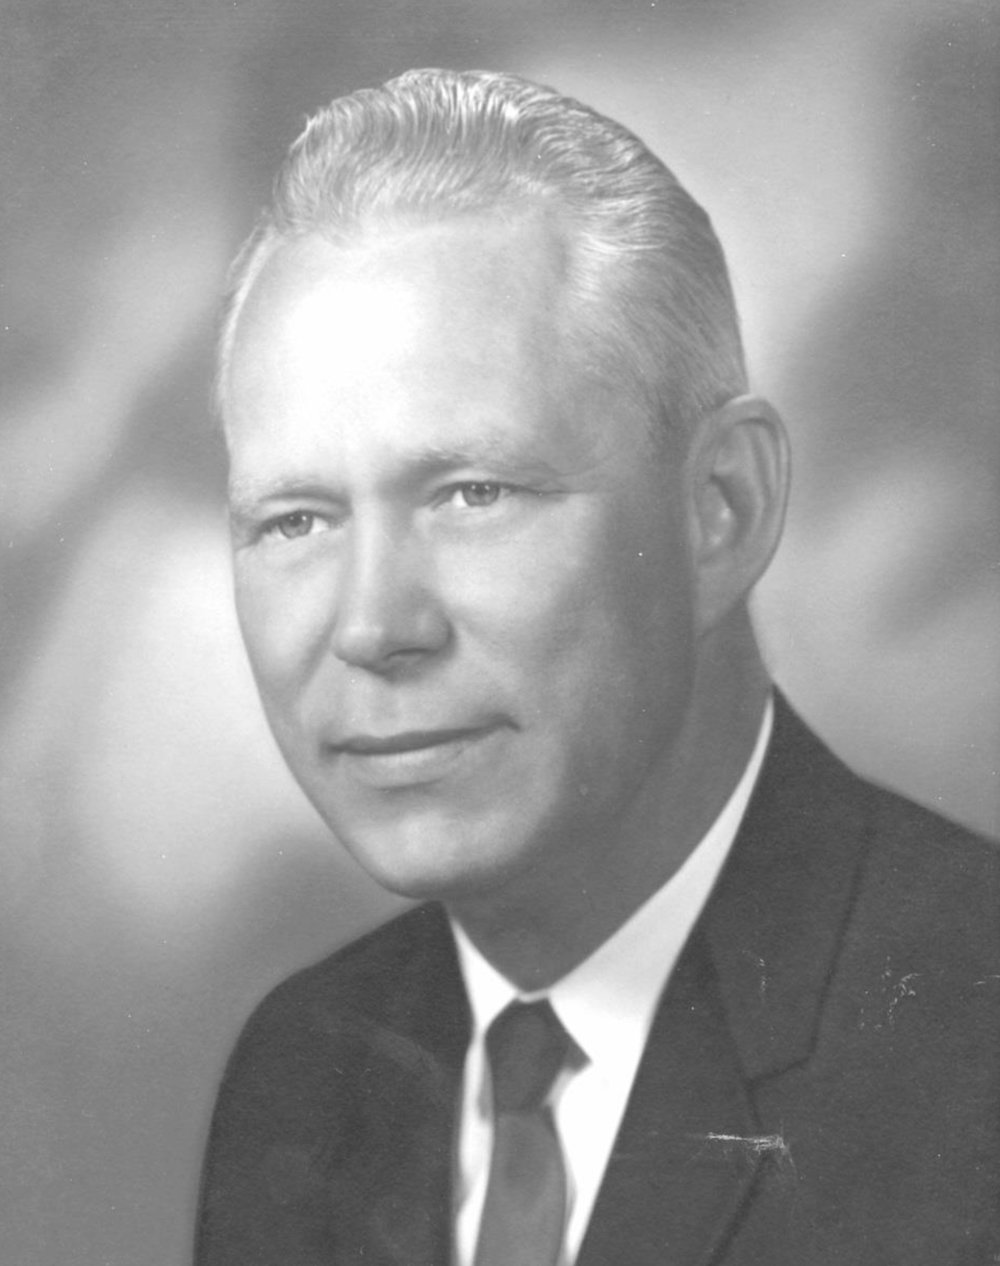 JACK G. PAULSEN